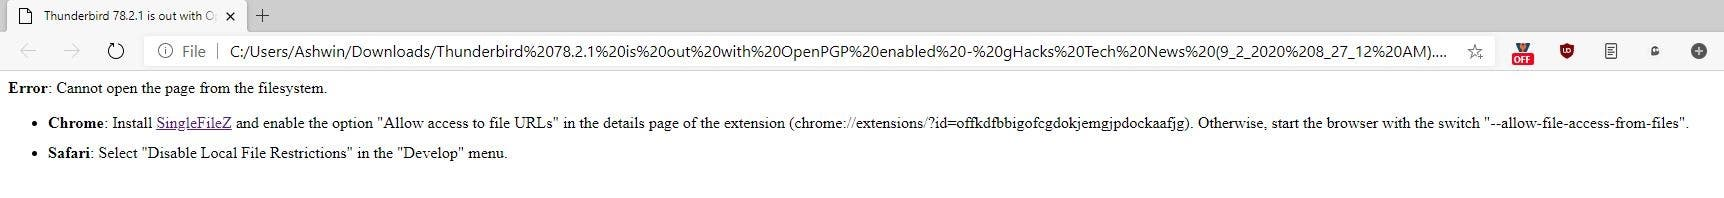 Requisitos para la extensión de SingleFileZ Chrome